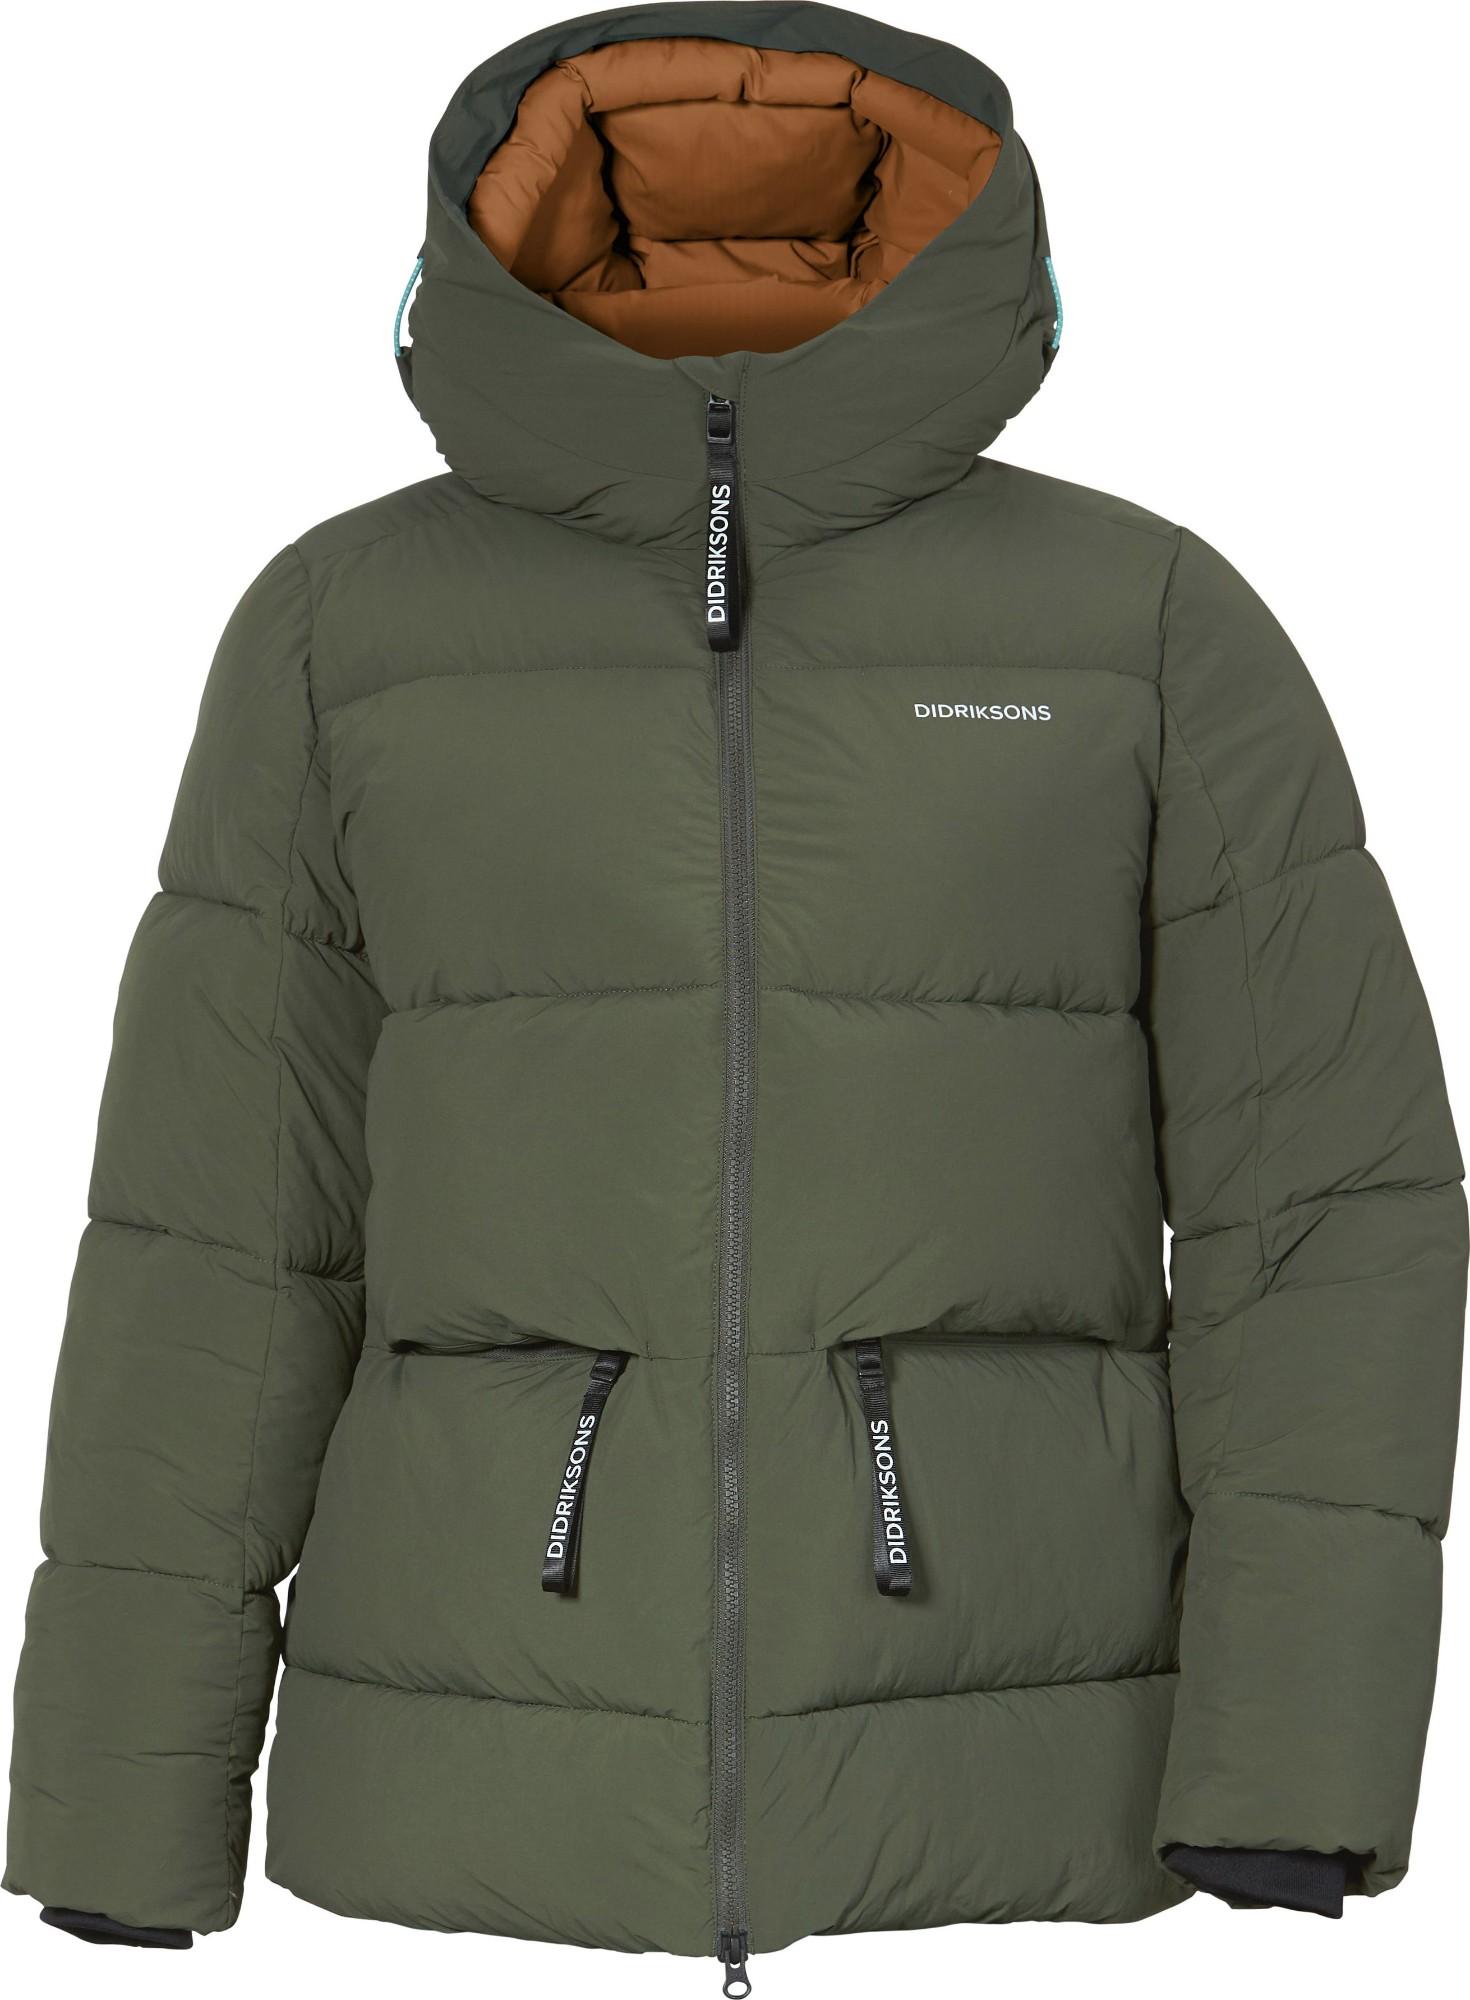 DIDRIKSONS Nomi Women's Jacket Deep Green EU40/42